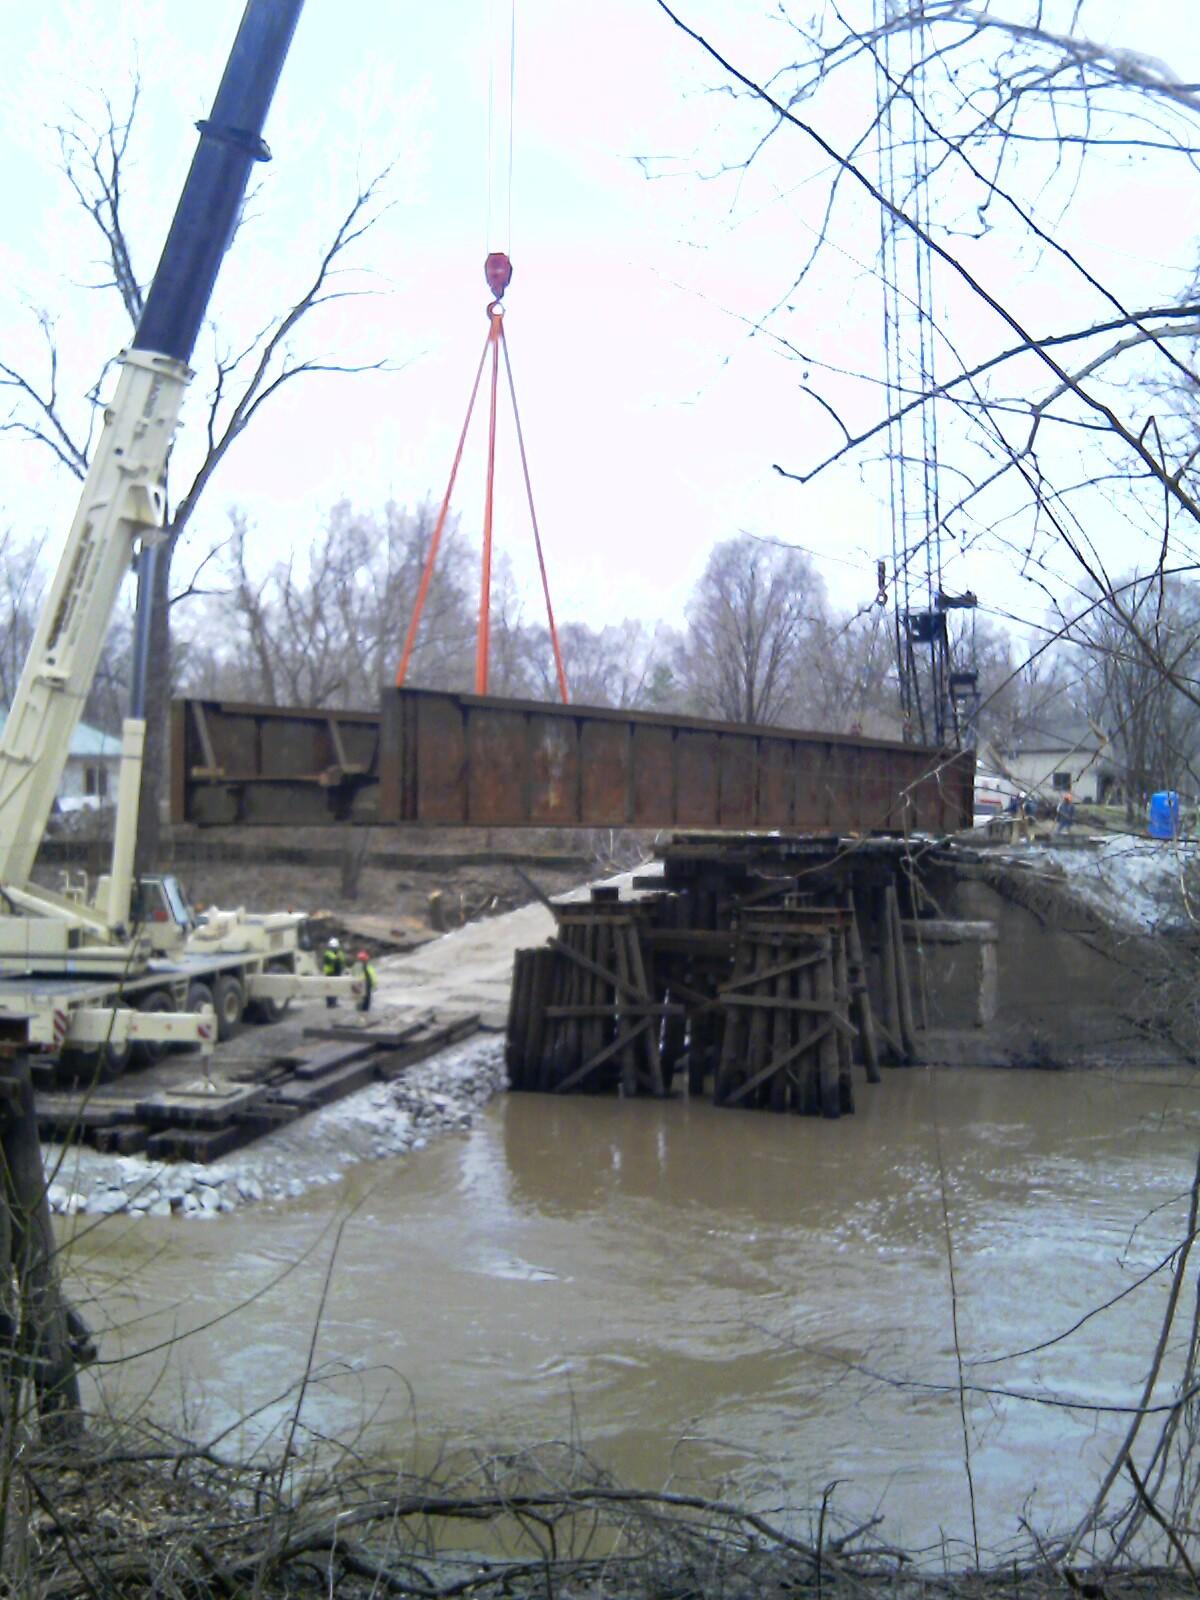 Roacheport, MO Historic Katy Trail Bridge Replacement